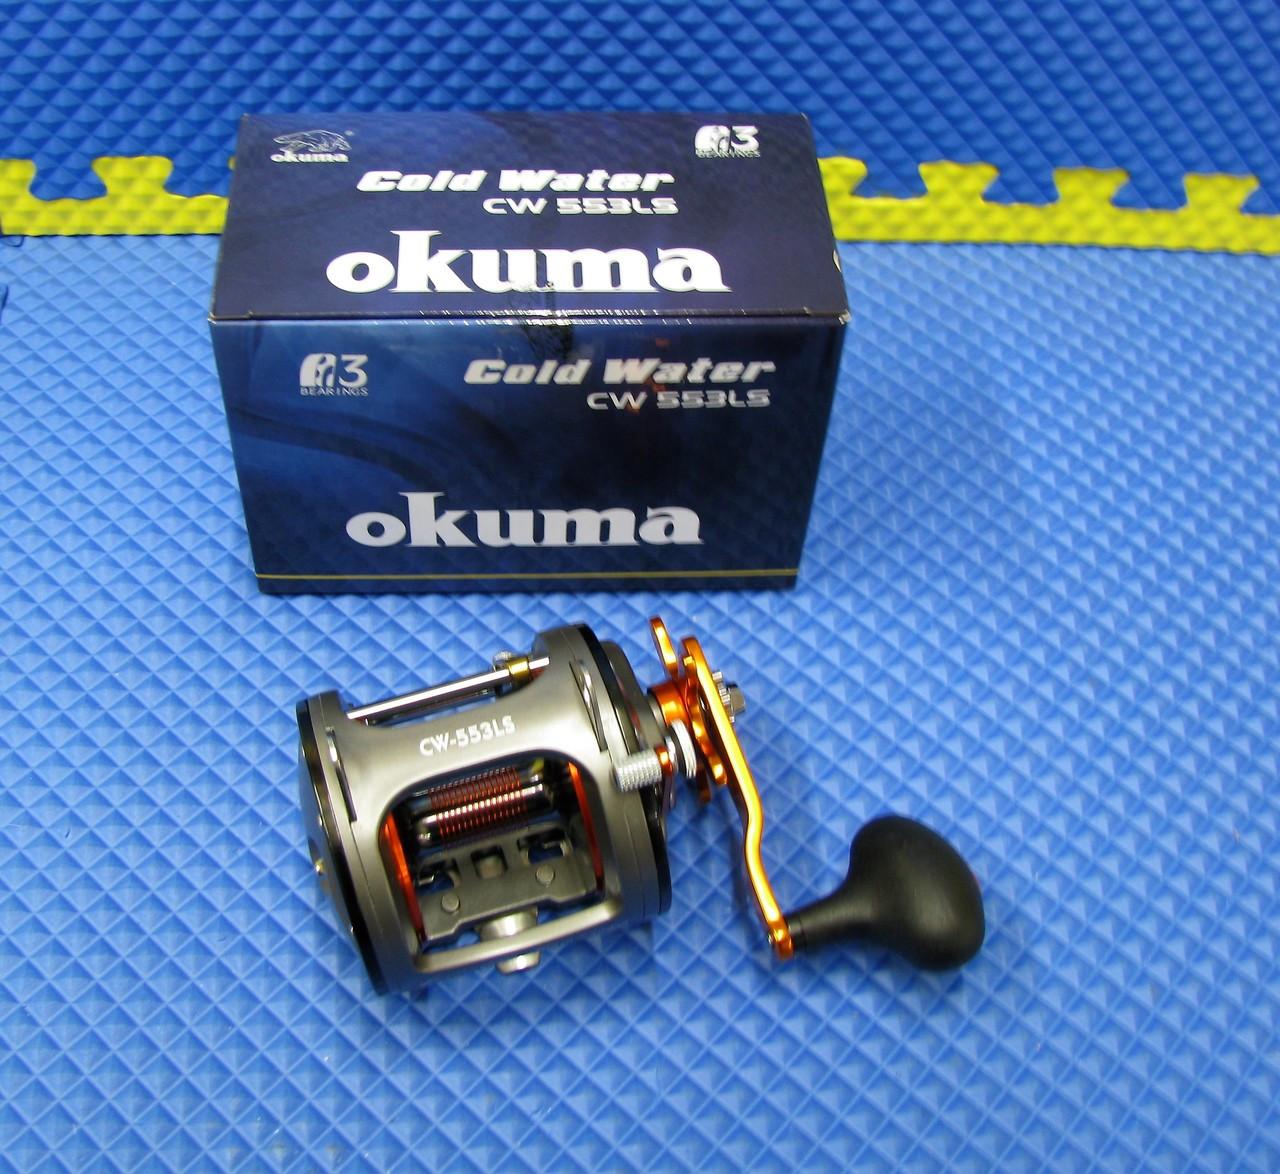 Okuma Cold Water High Speed Levelwind Trolling Reel CW-553LS